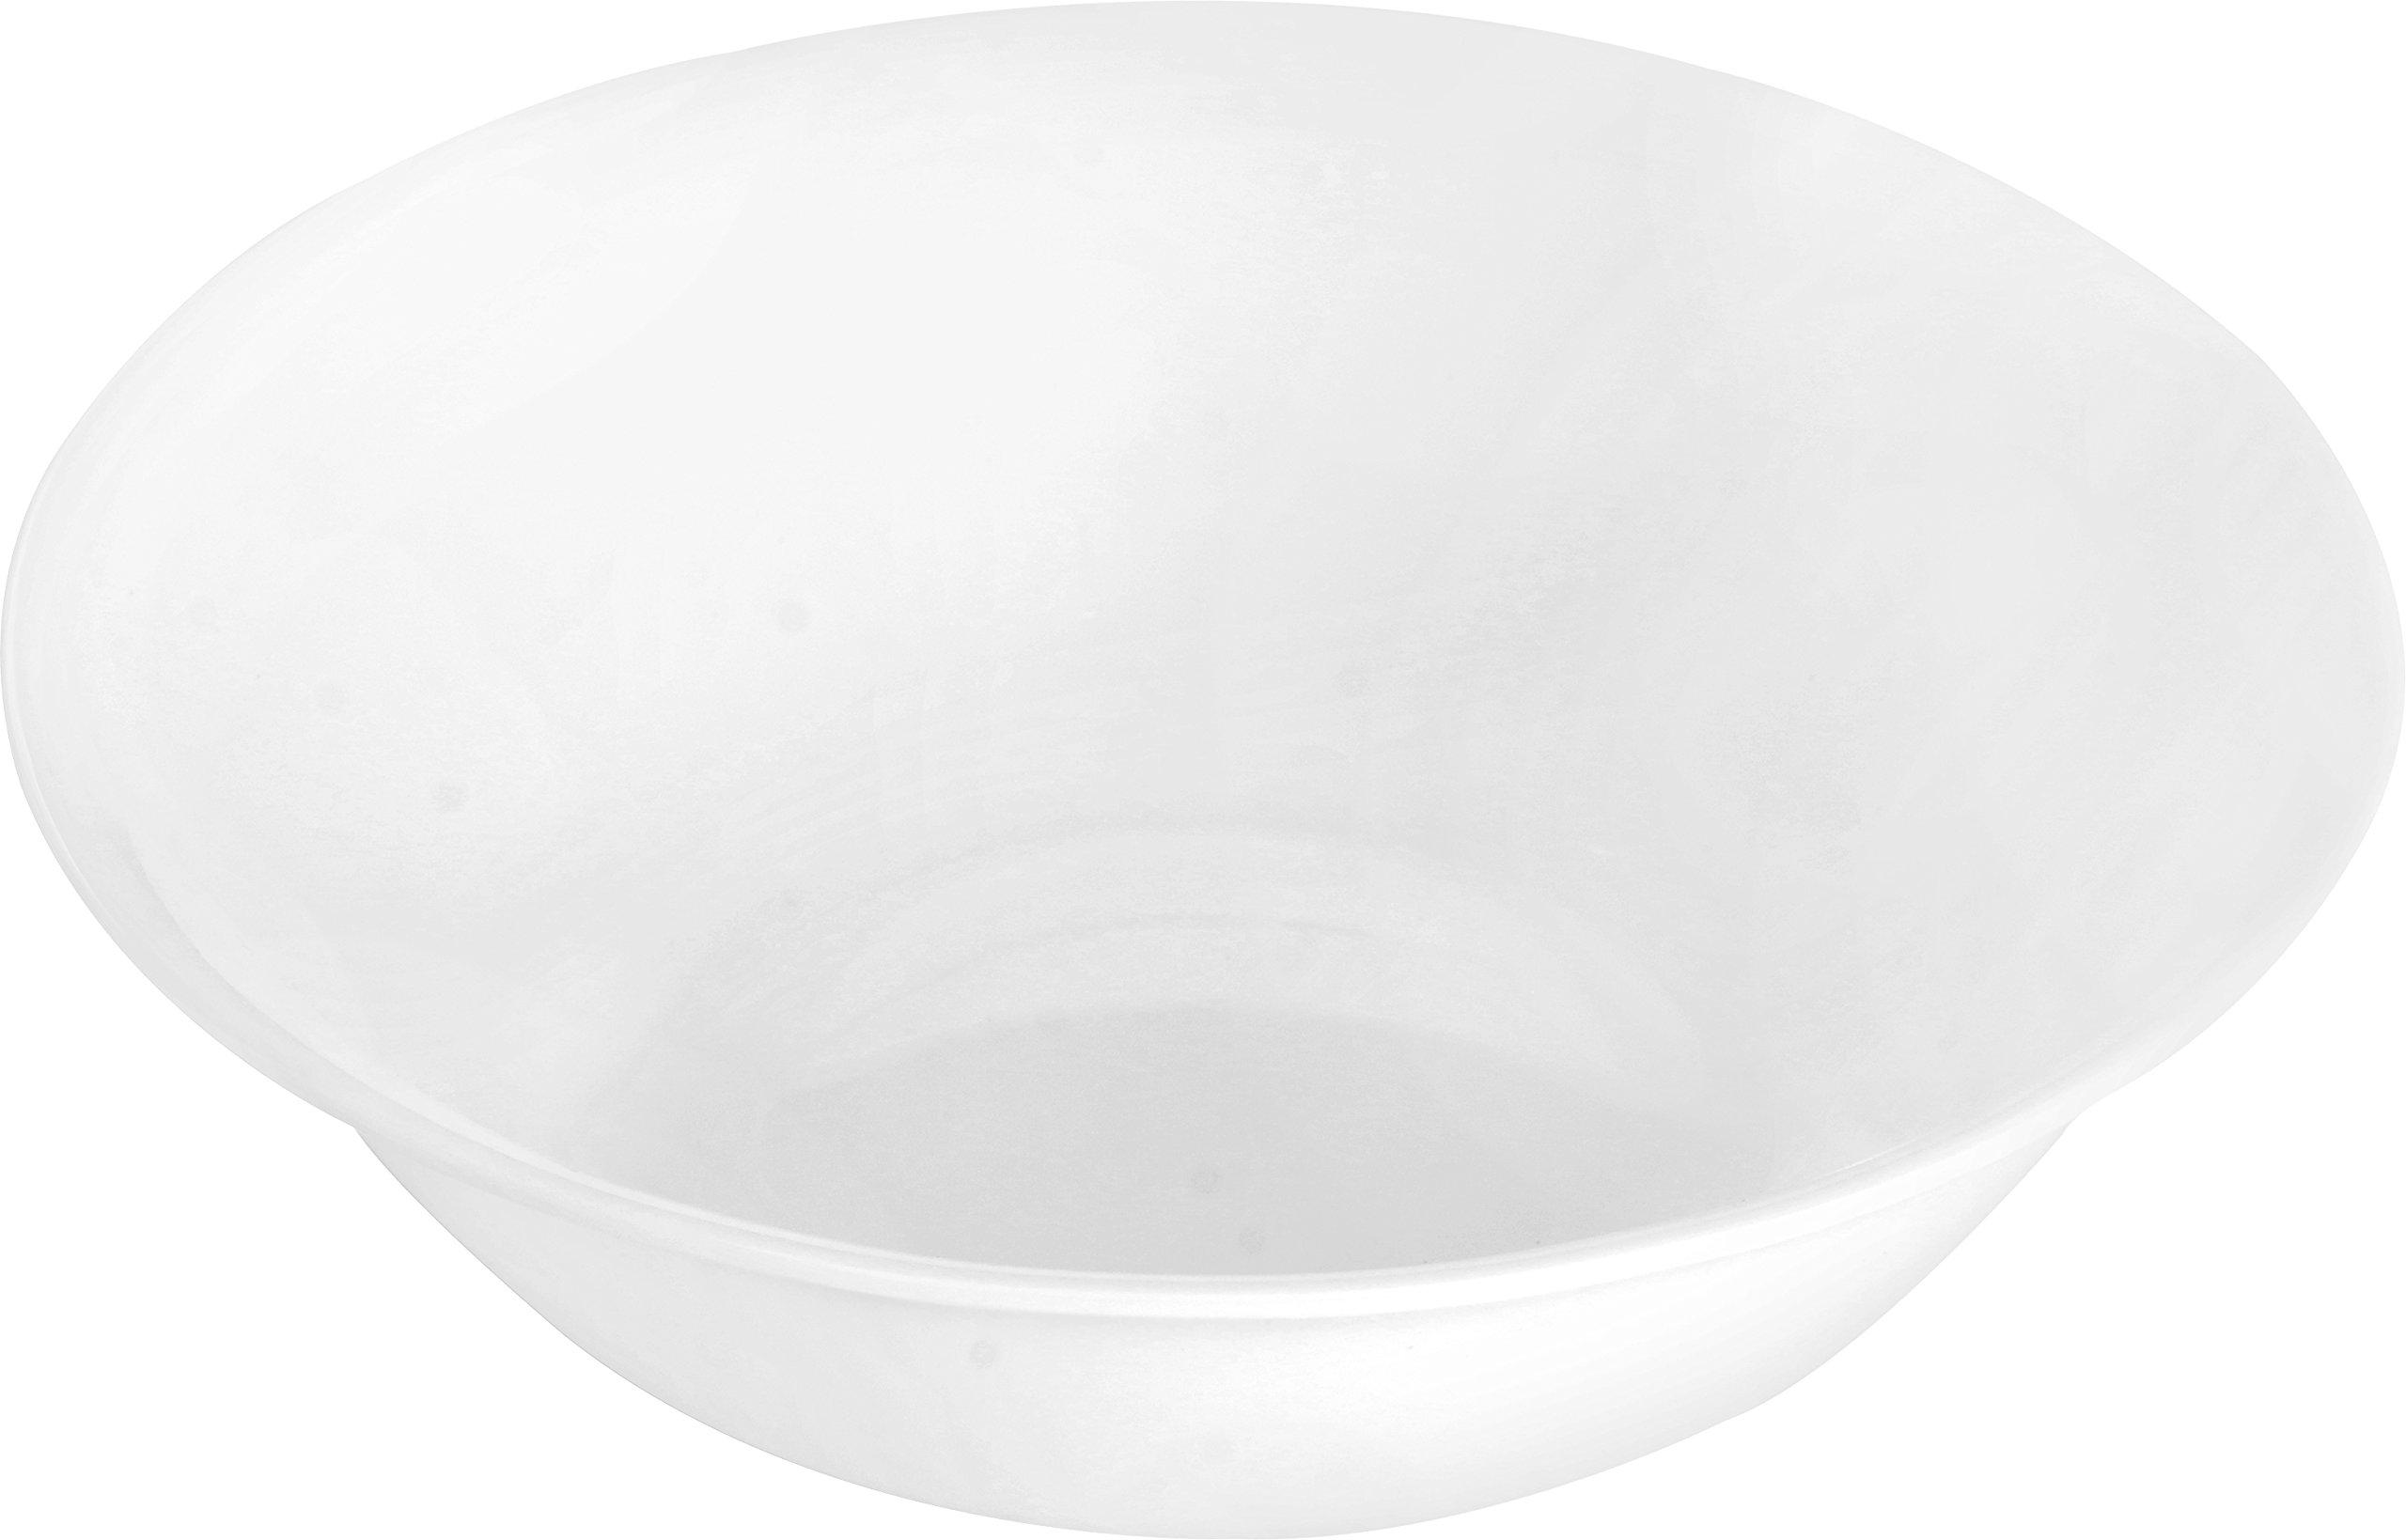 Utopia Kitchen 6 Pieces Bowl Set - Dishwasher Safe Opal Glassware - Microwave/Oven Friendly by Utopia Kitchen (Image #3)